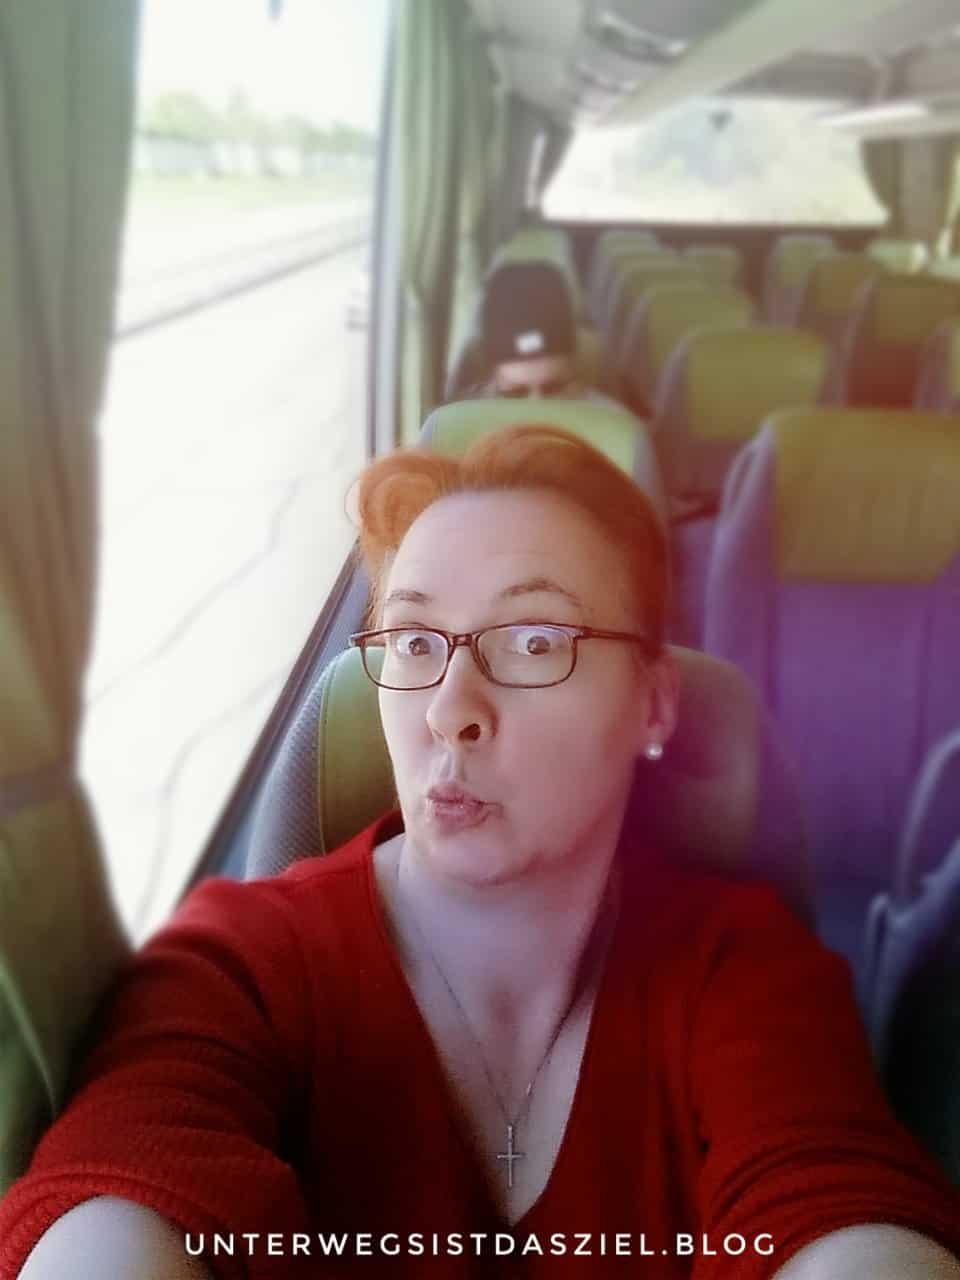 albern im Flixbus